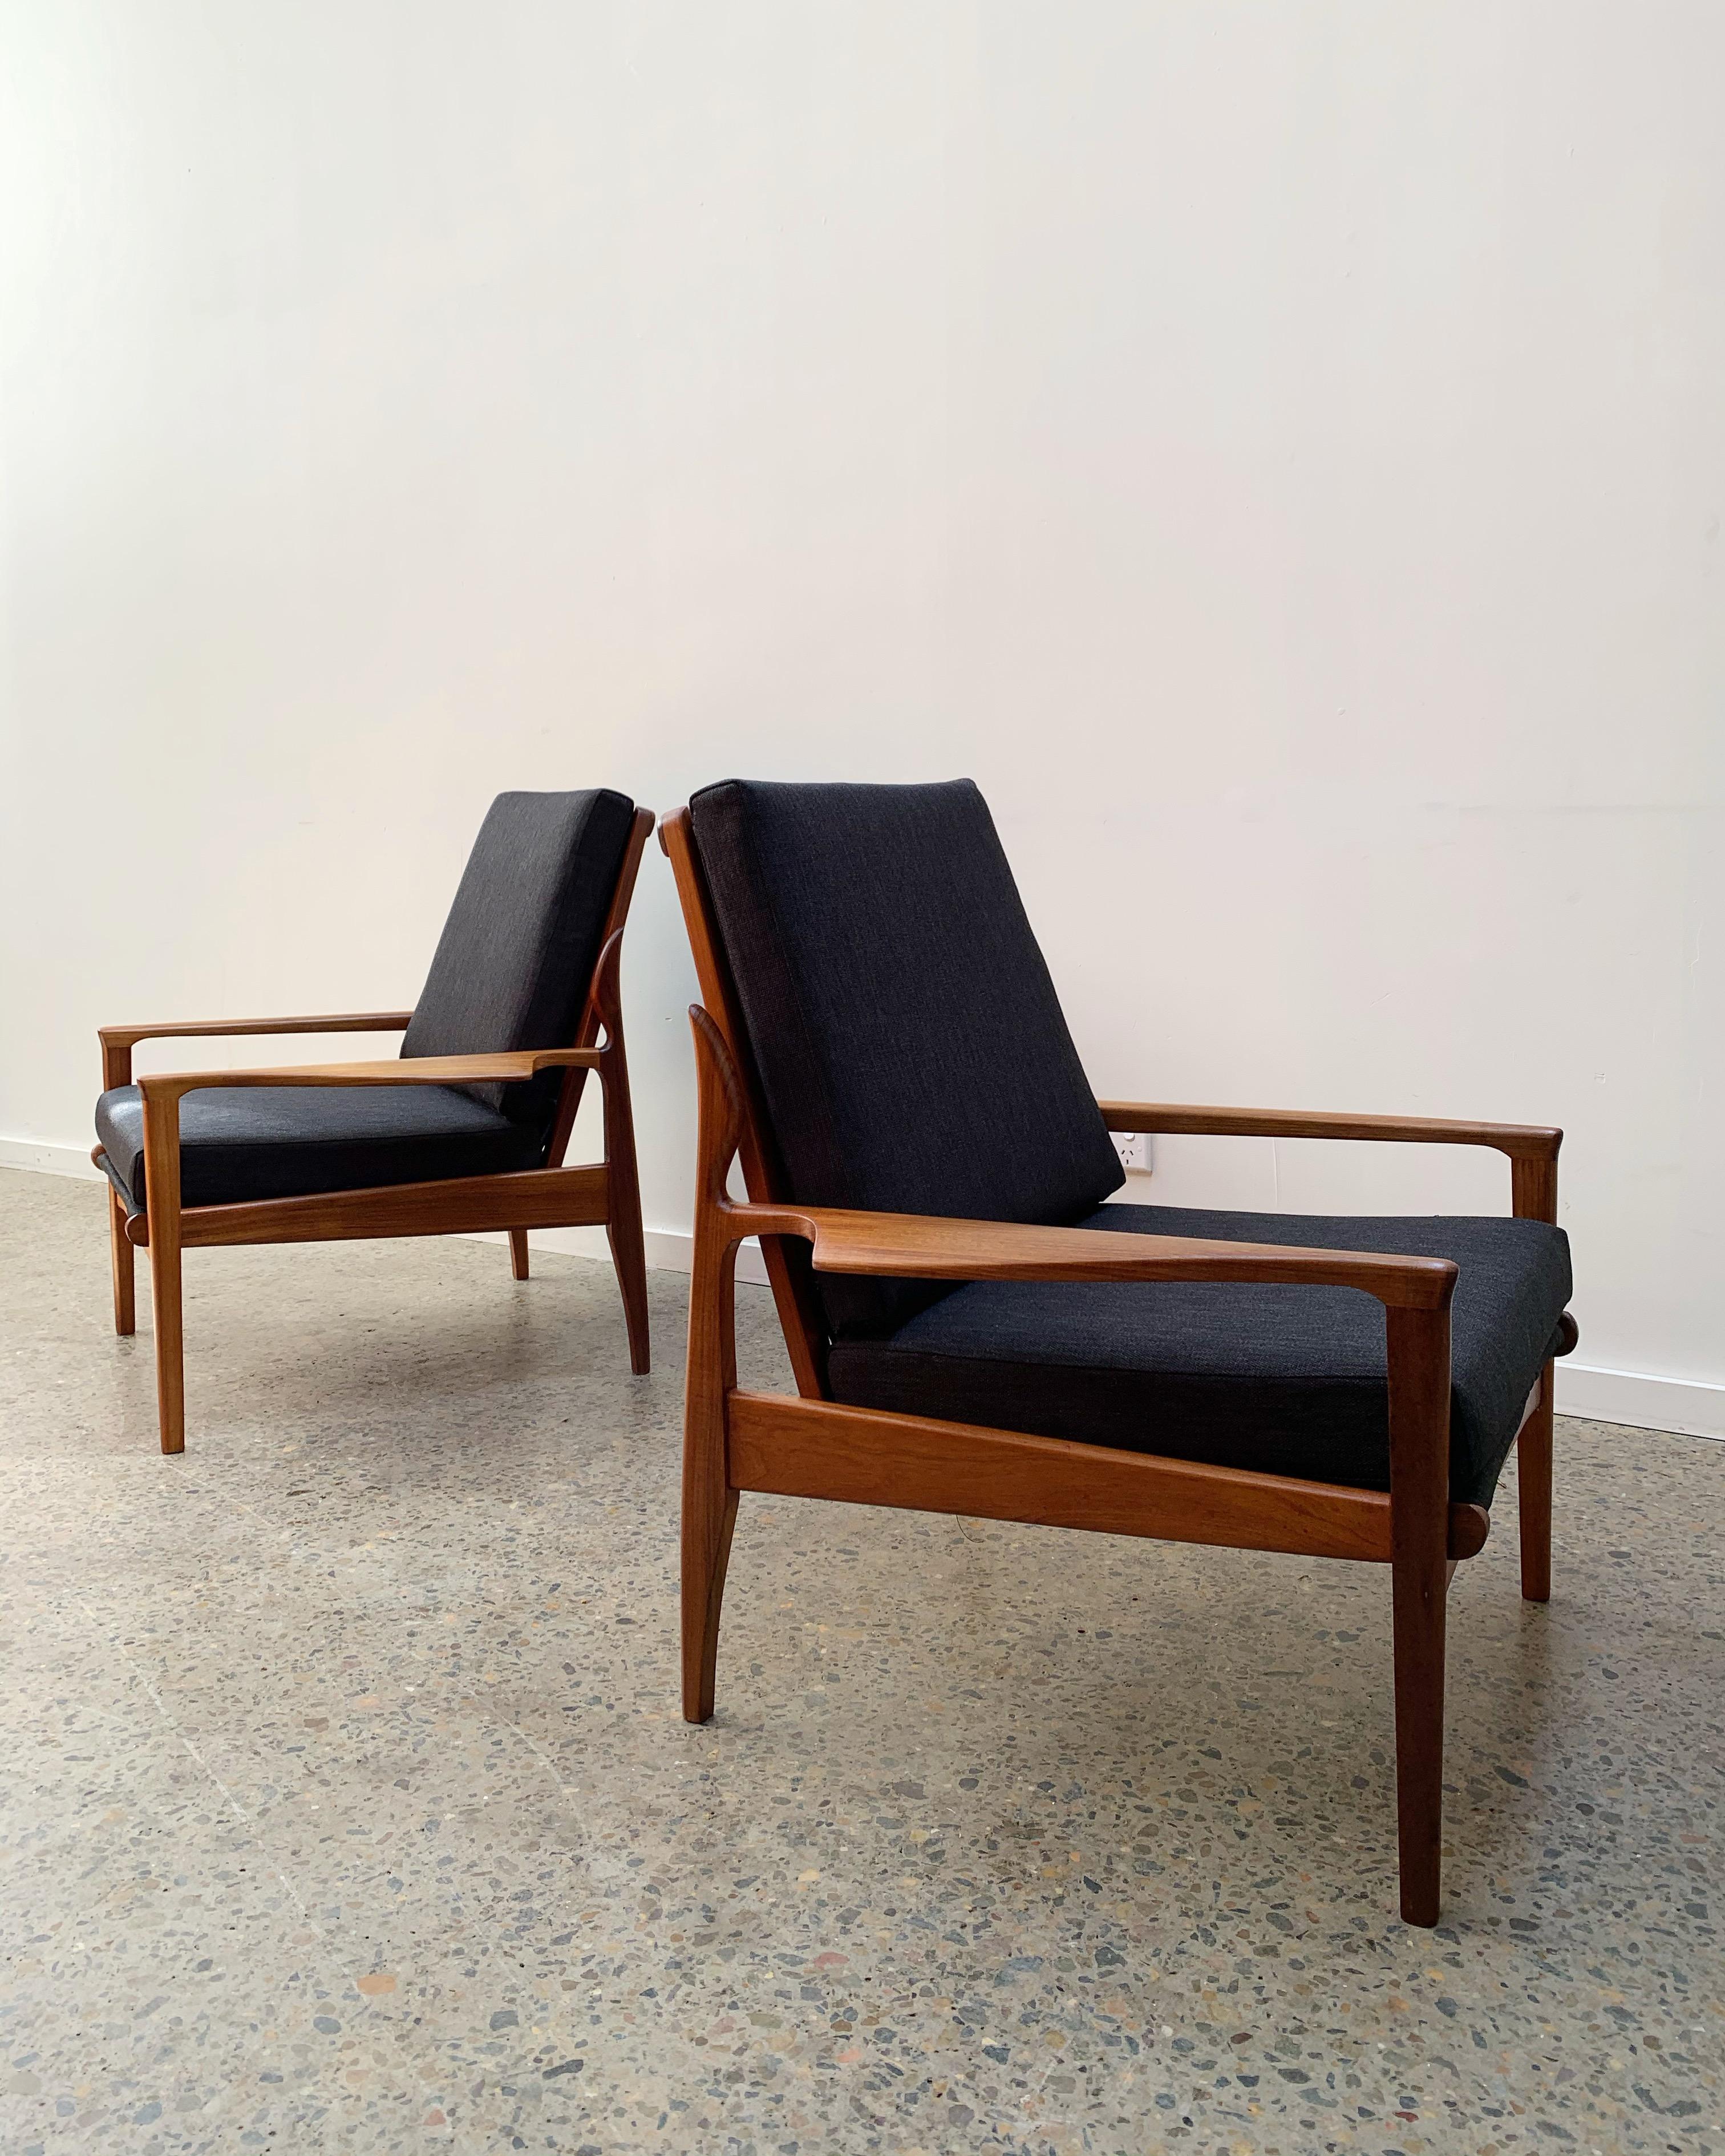 Fler Narvik armchairs